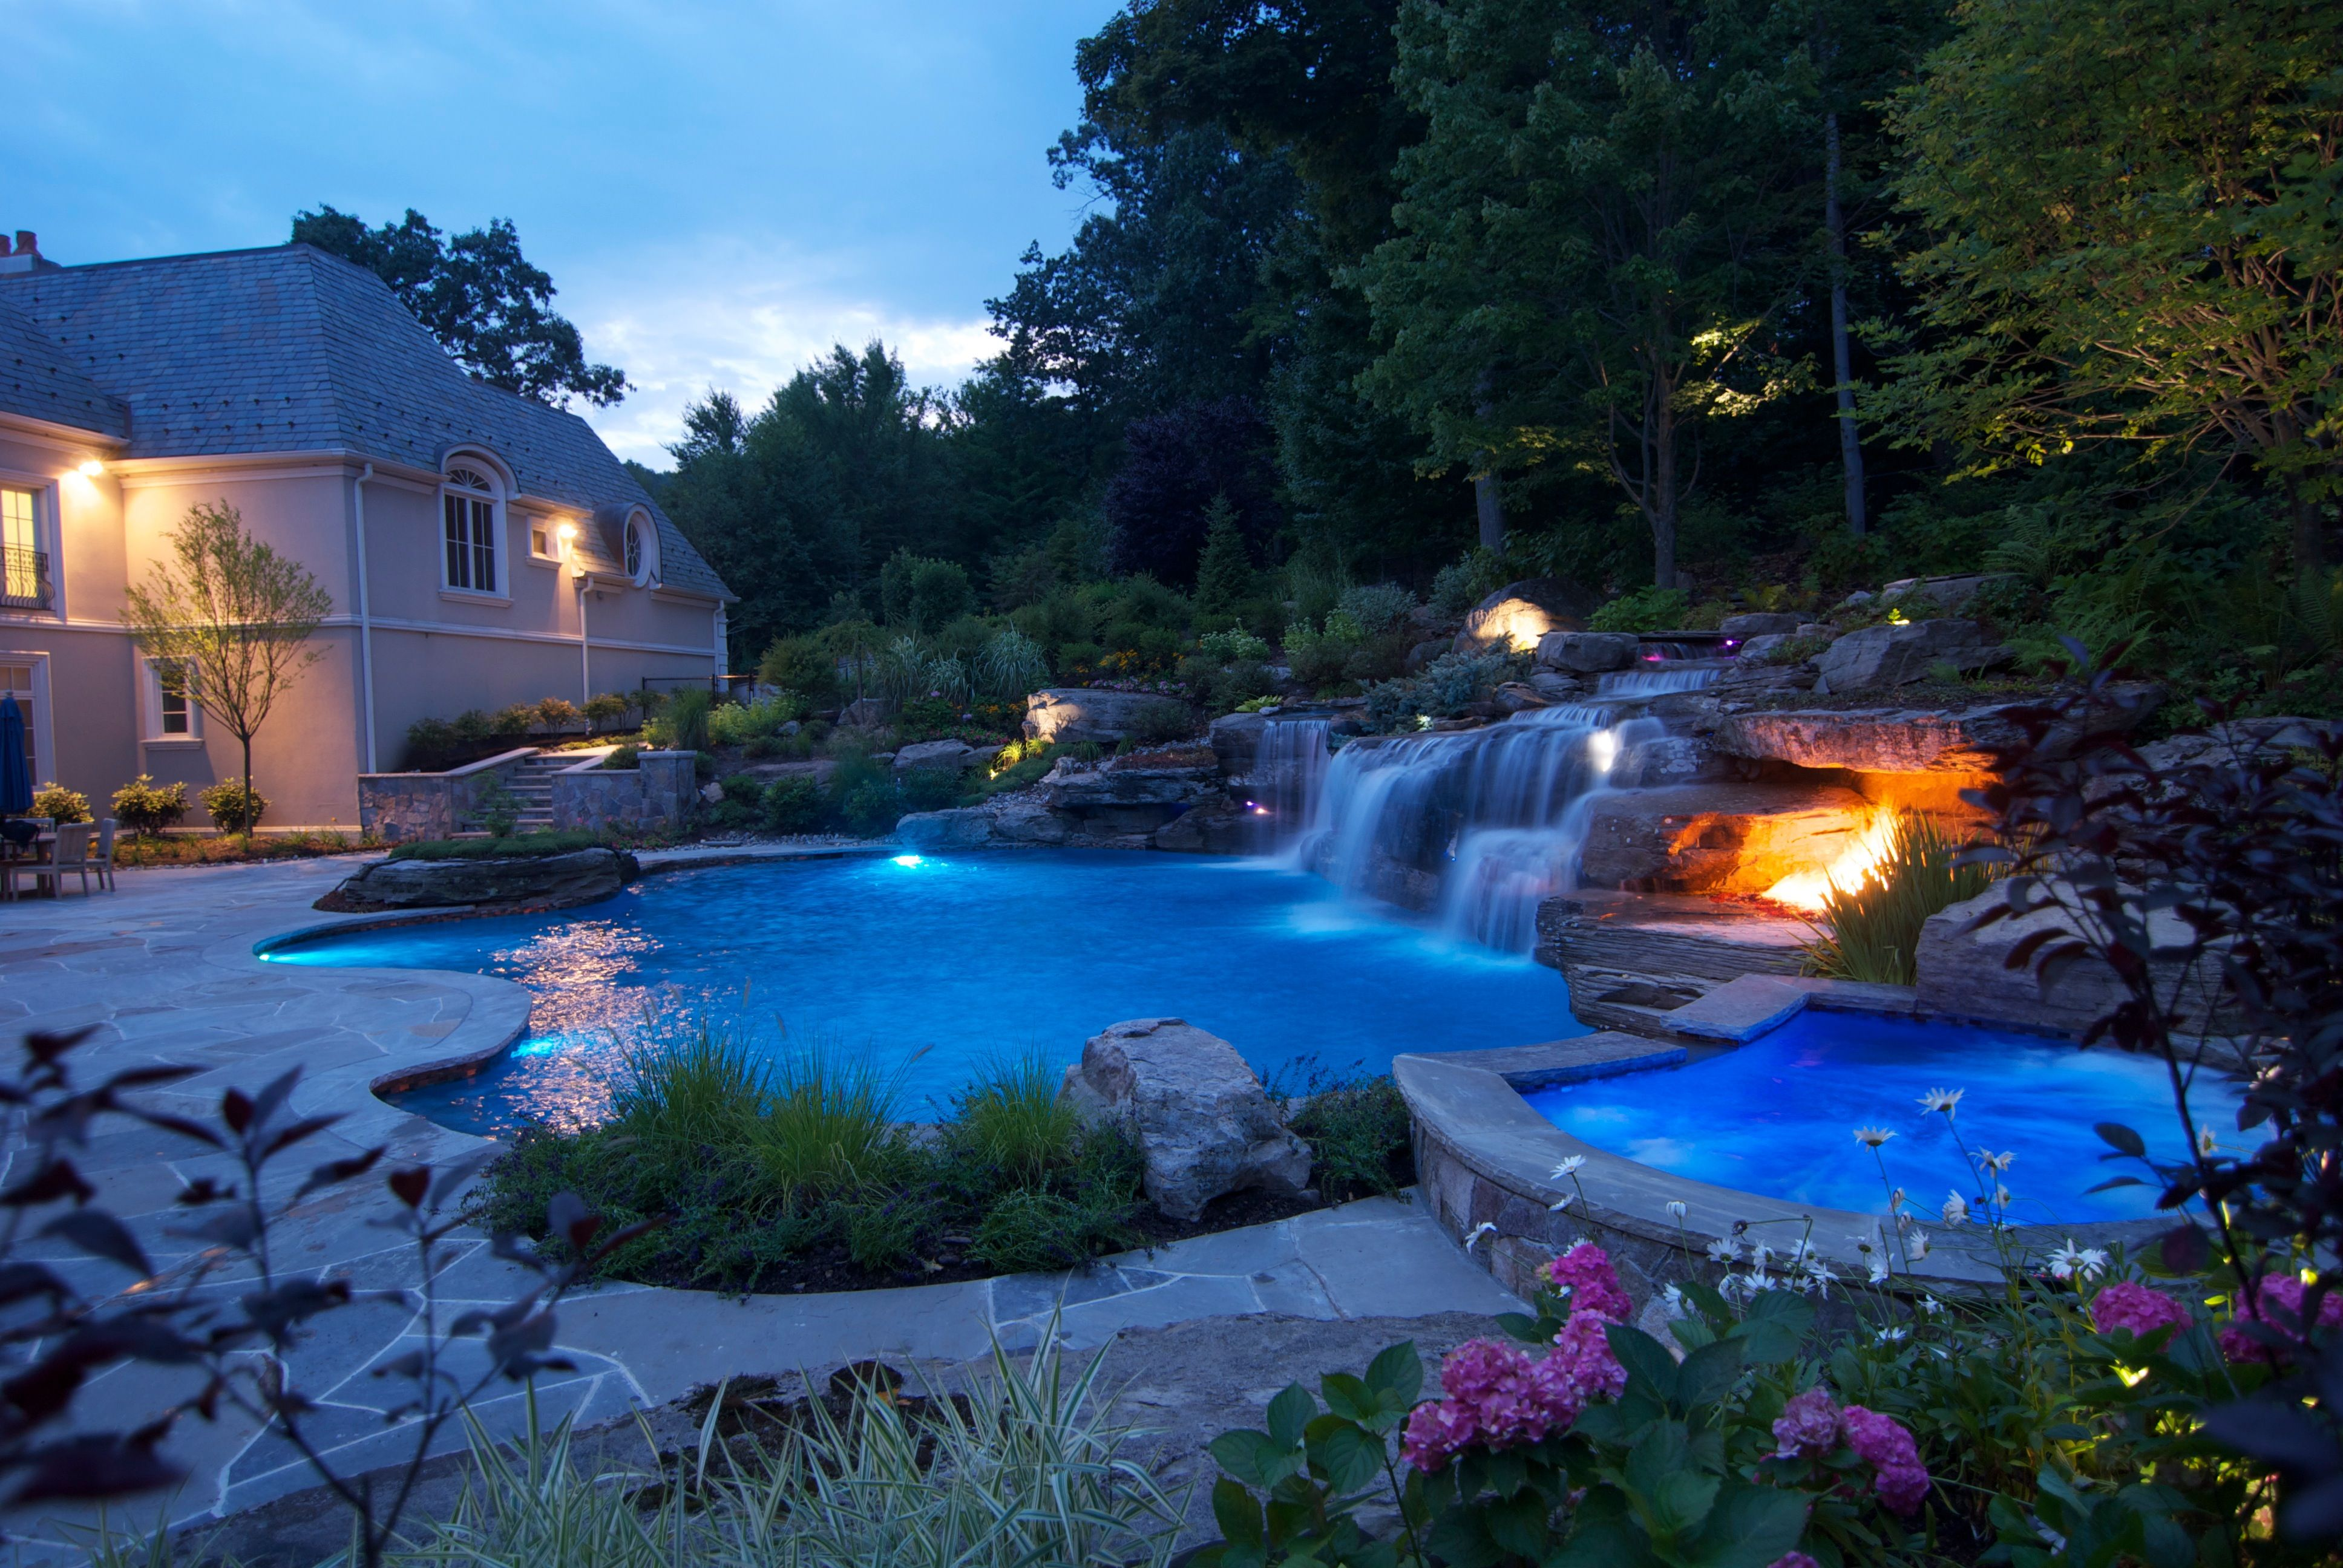 large backyard landscaping ideas | Large Backyard Ideas NJ ... on Luxury Backyard Design id=50747